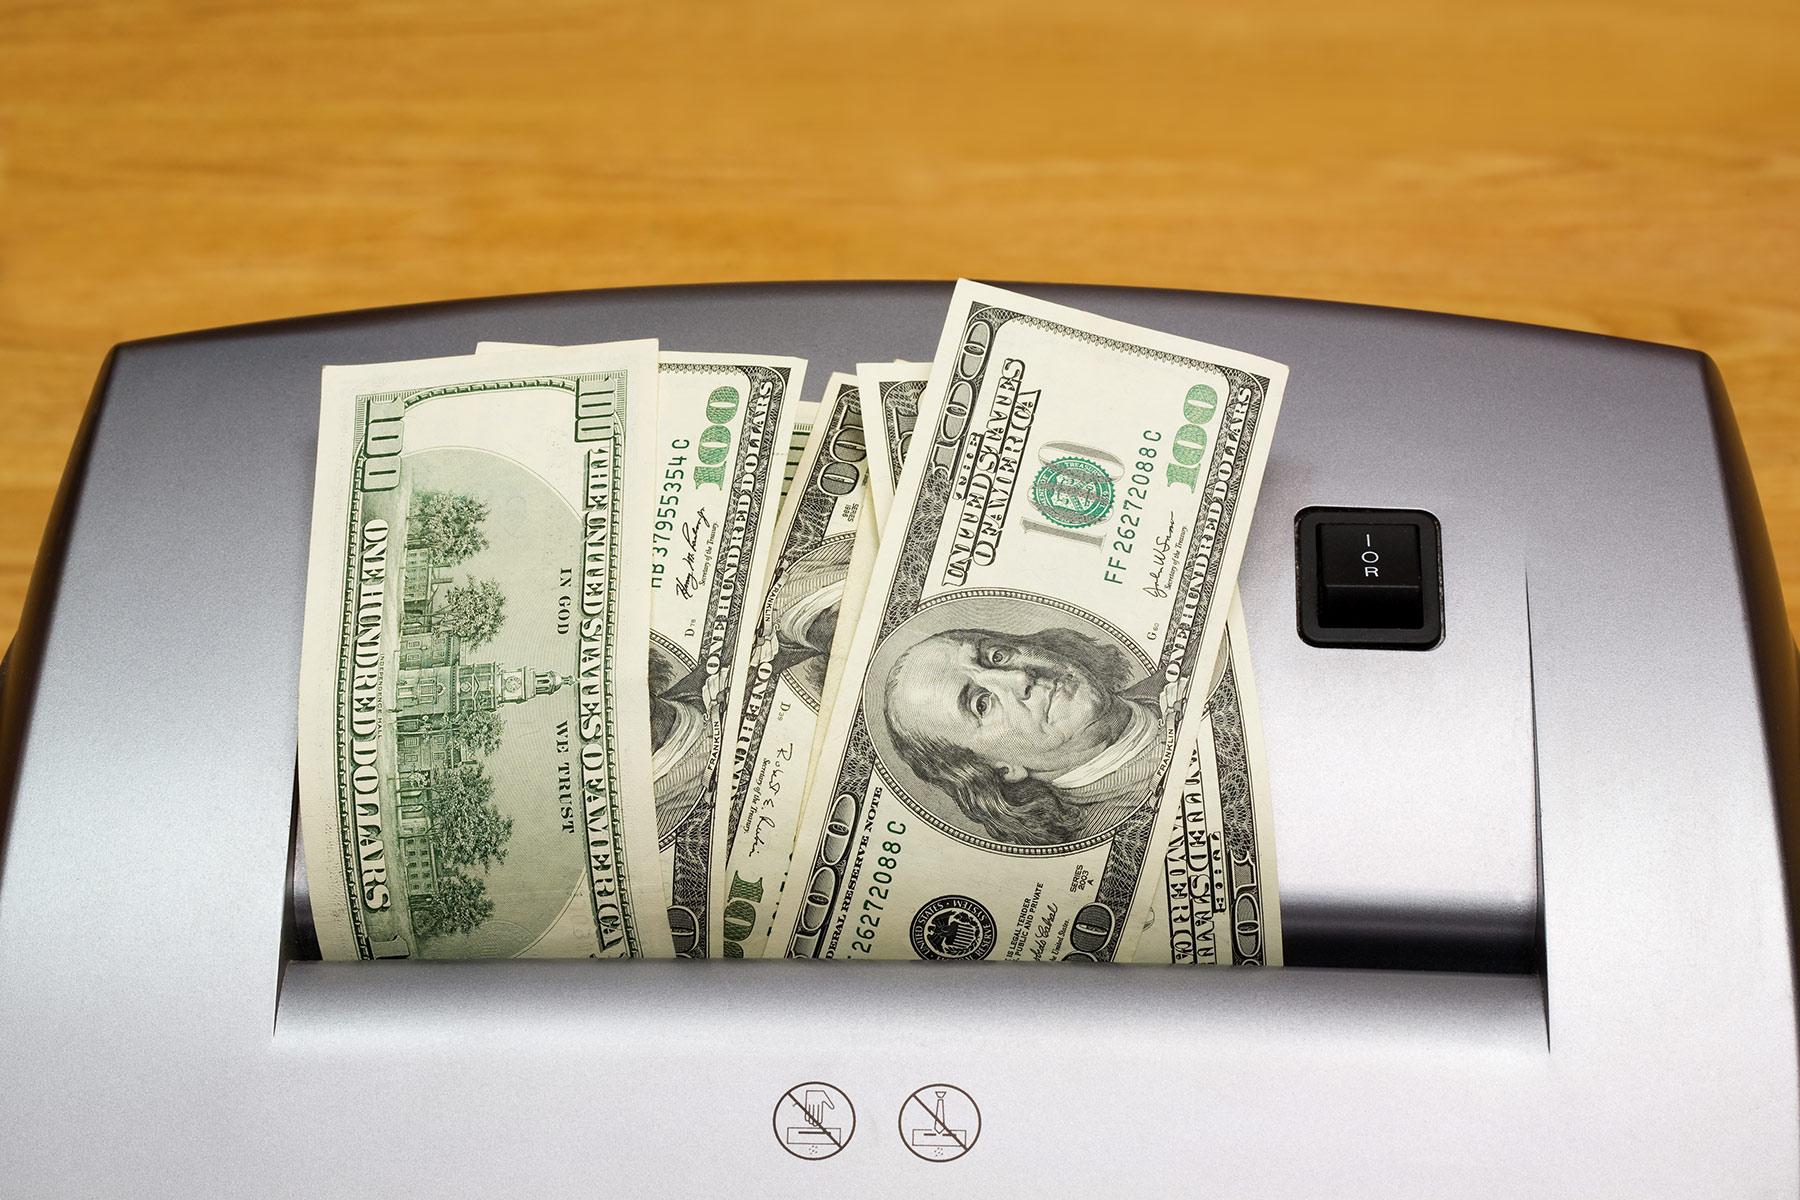 photo of money in shredder